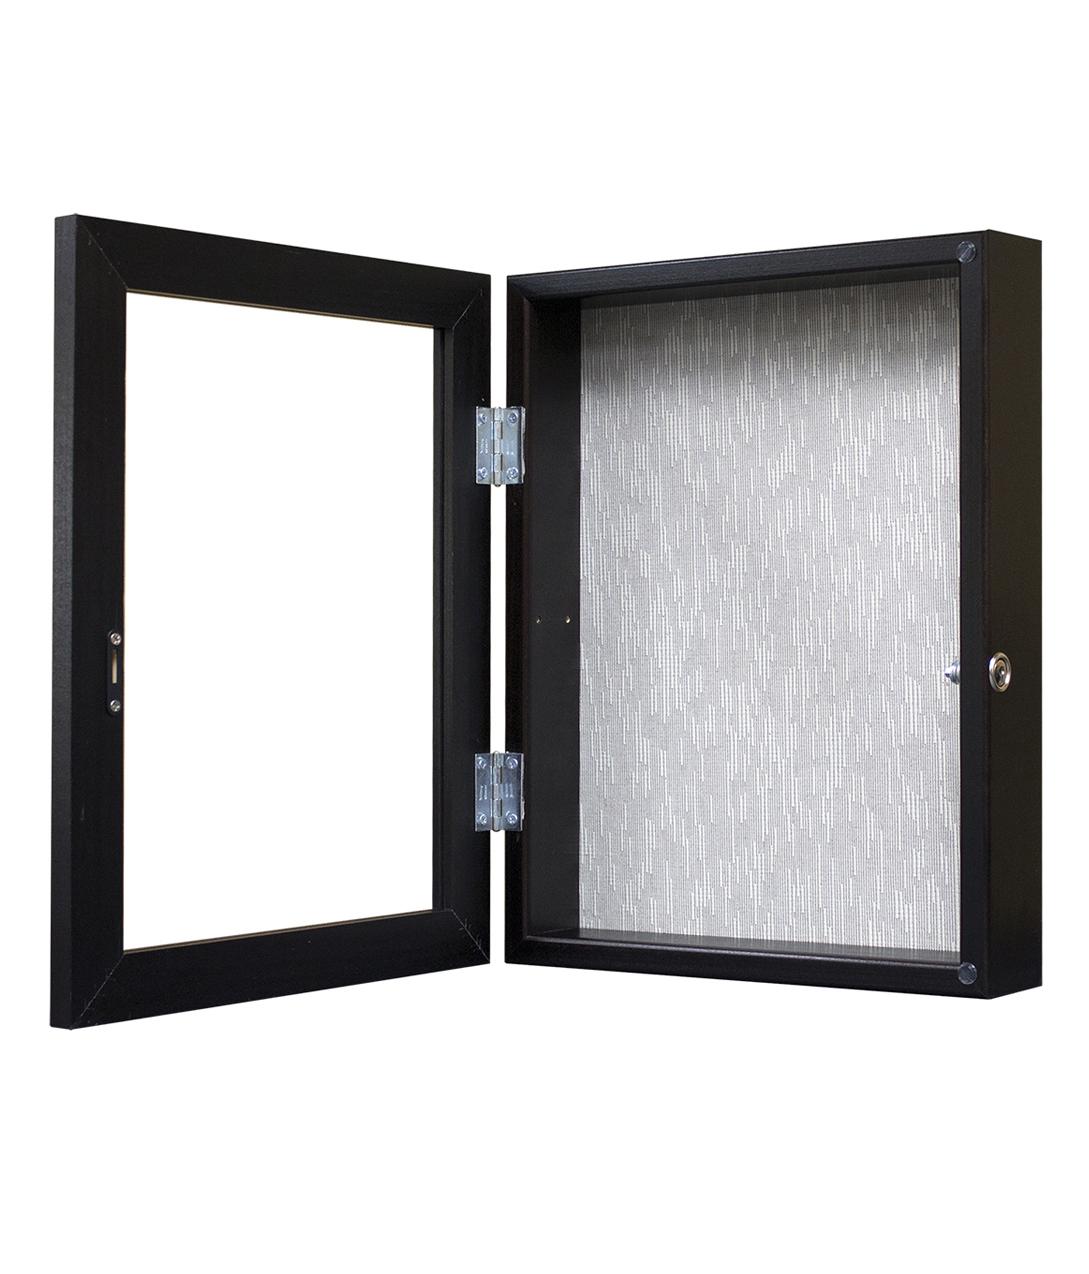 Cabinet-03.jpg